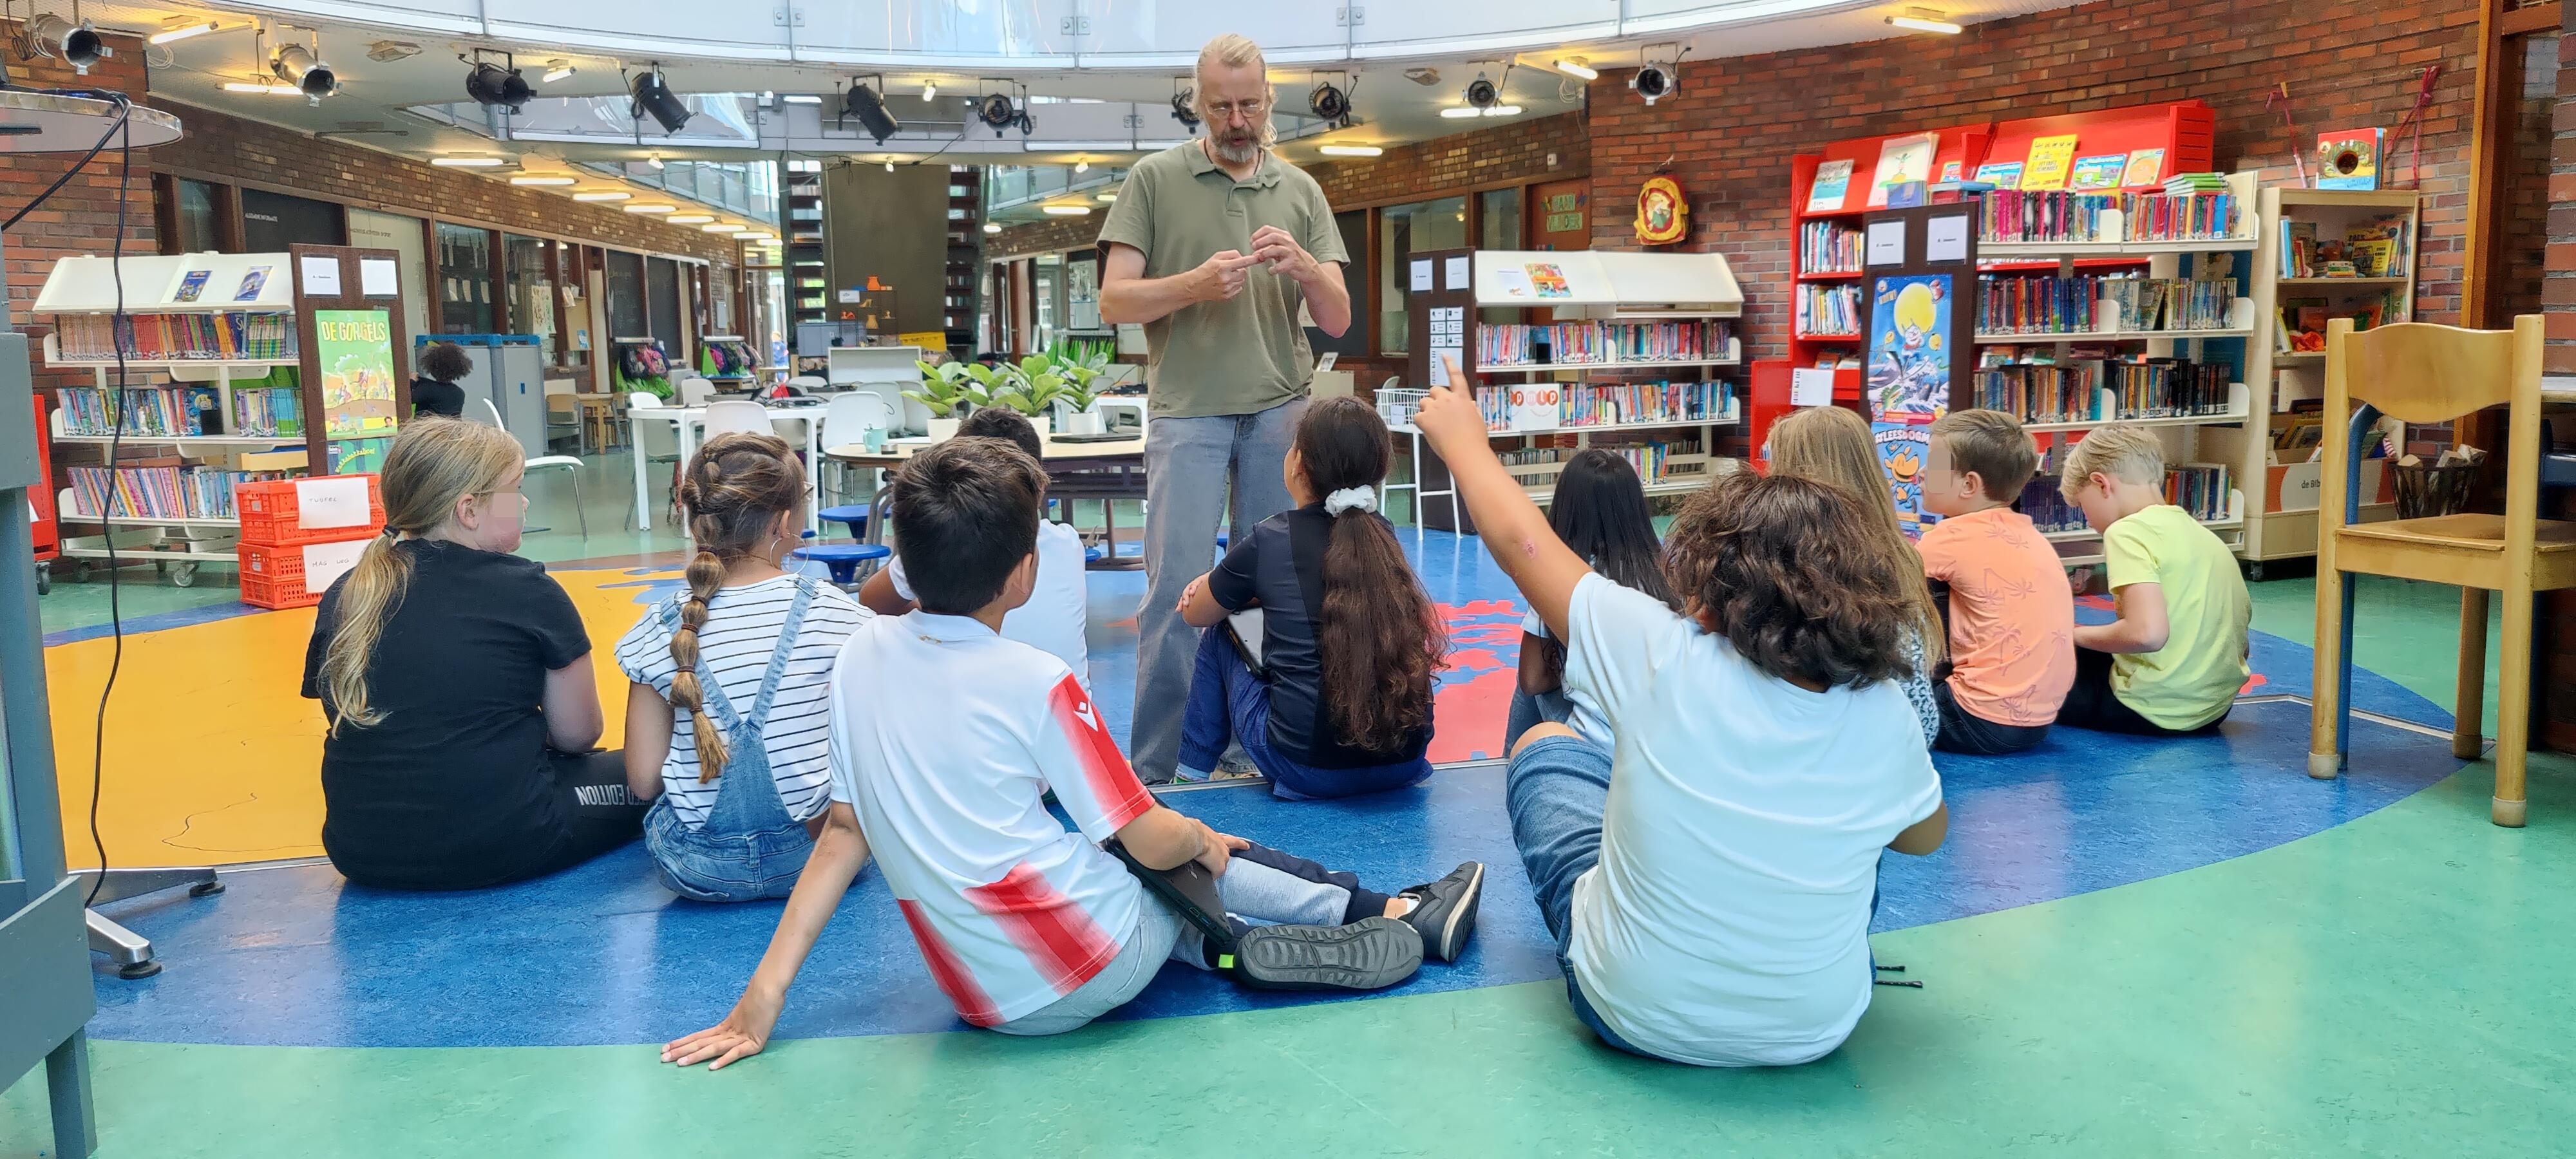 Agenda – Junior IOT op basisschool Atalanta in 2021/2022